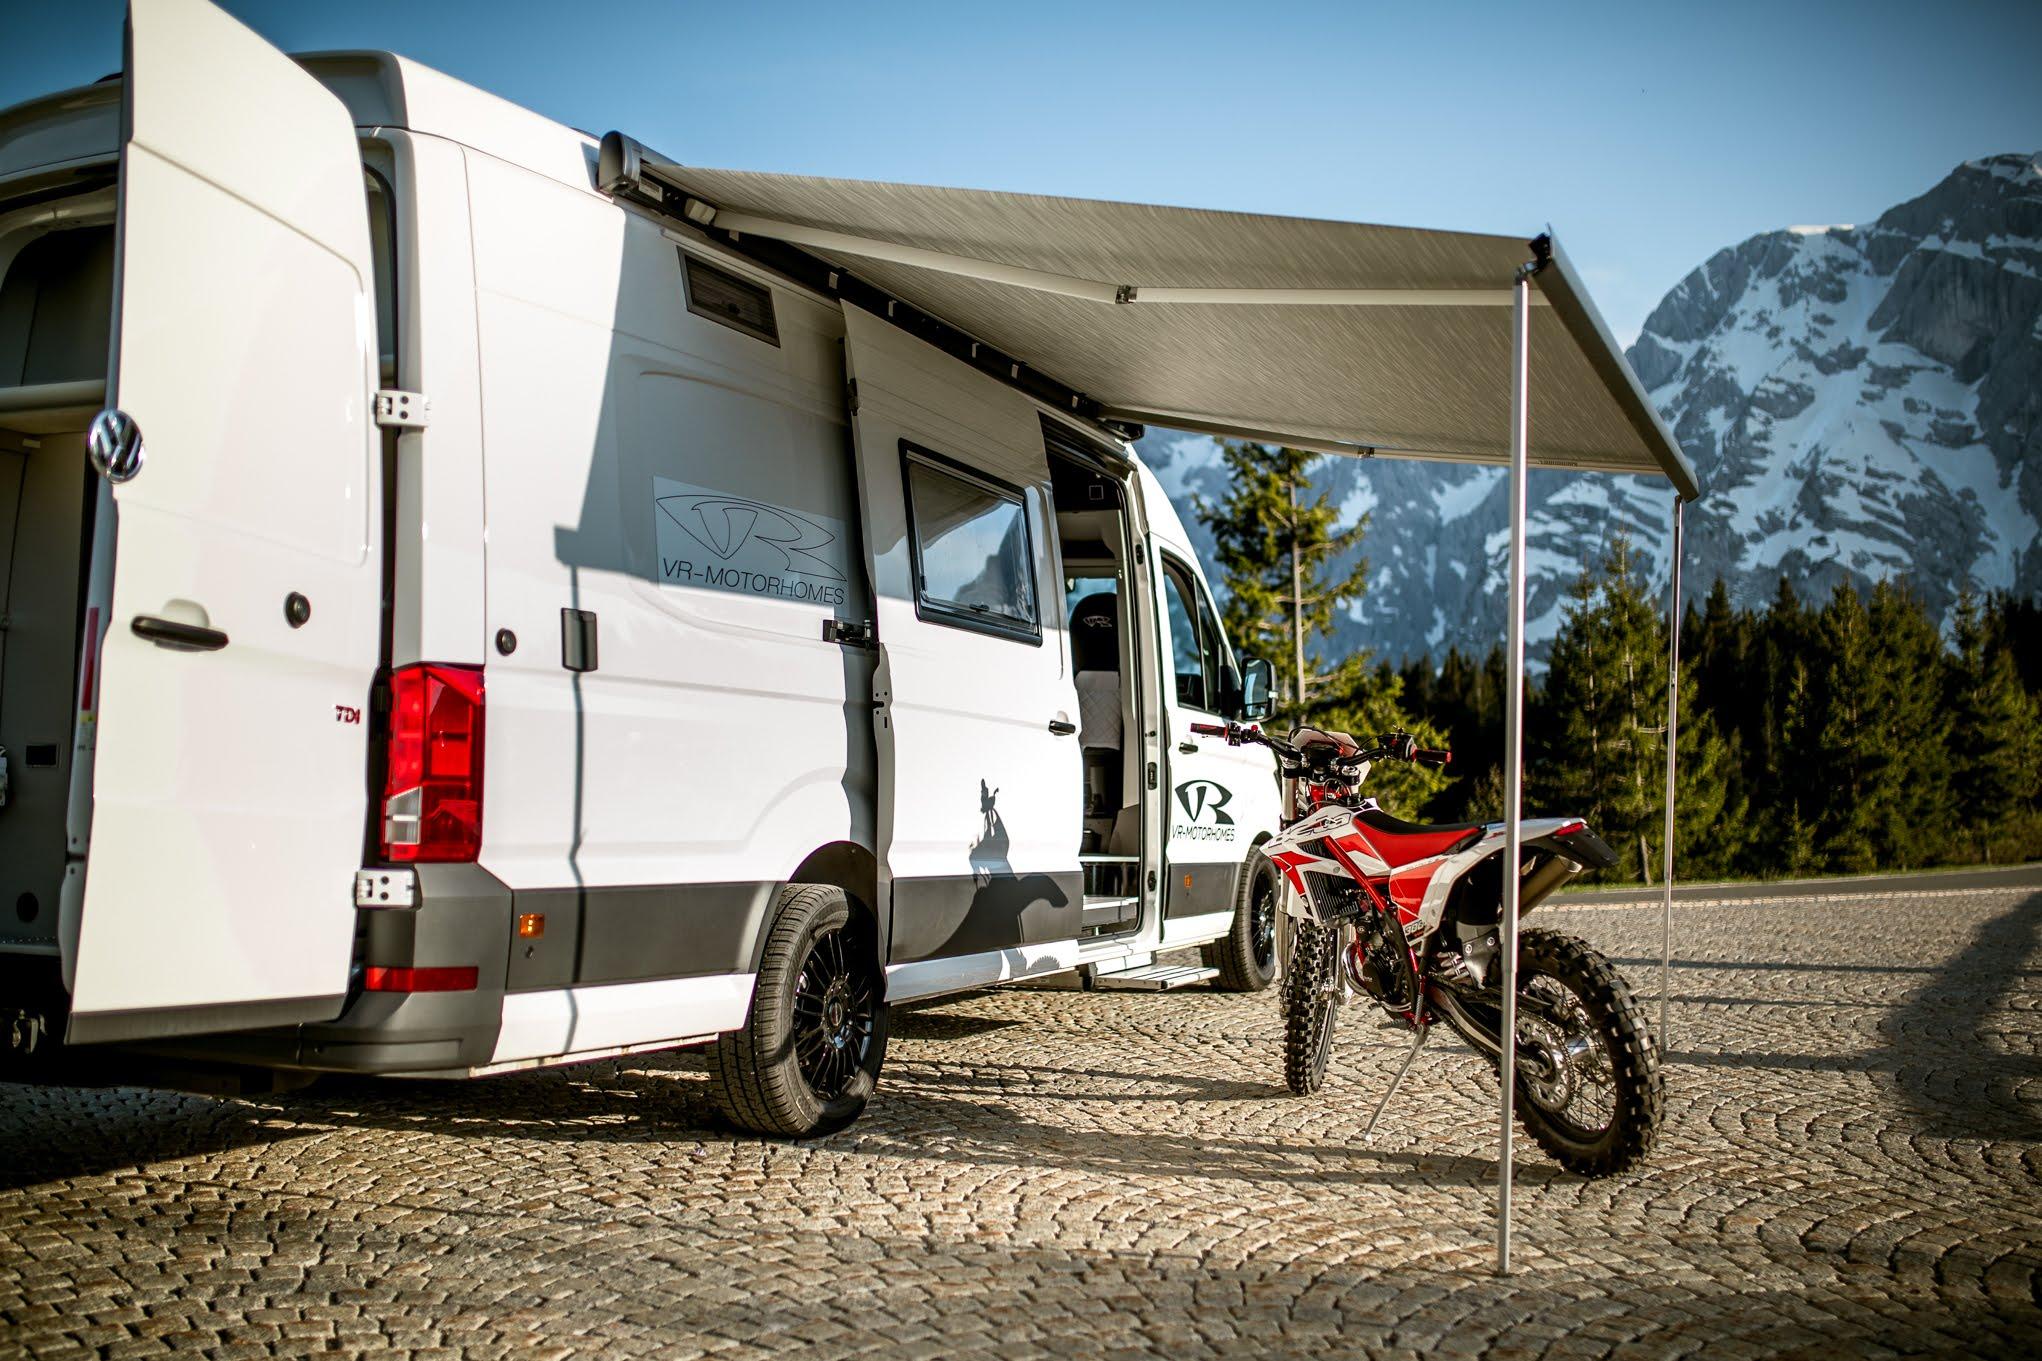 transporter mit motorradgarage mx motocross enduro bmw gs on board vr motorhomes